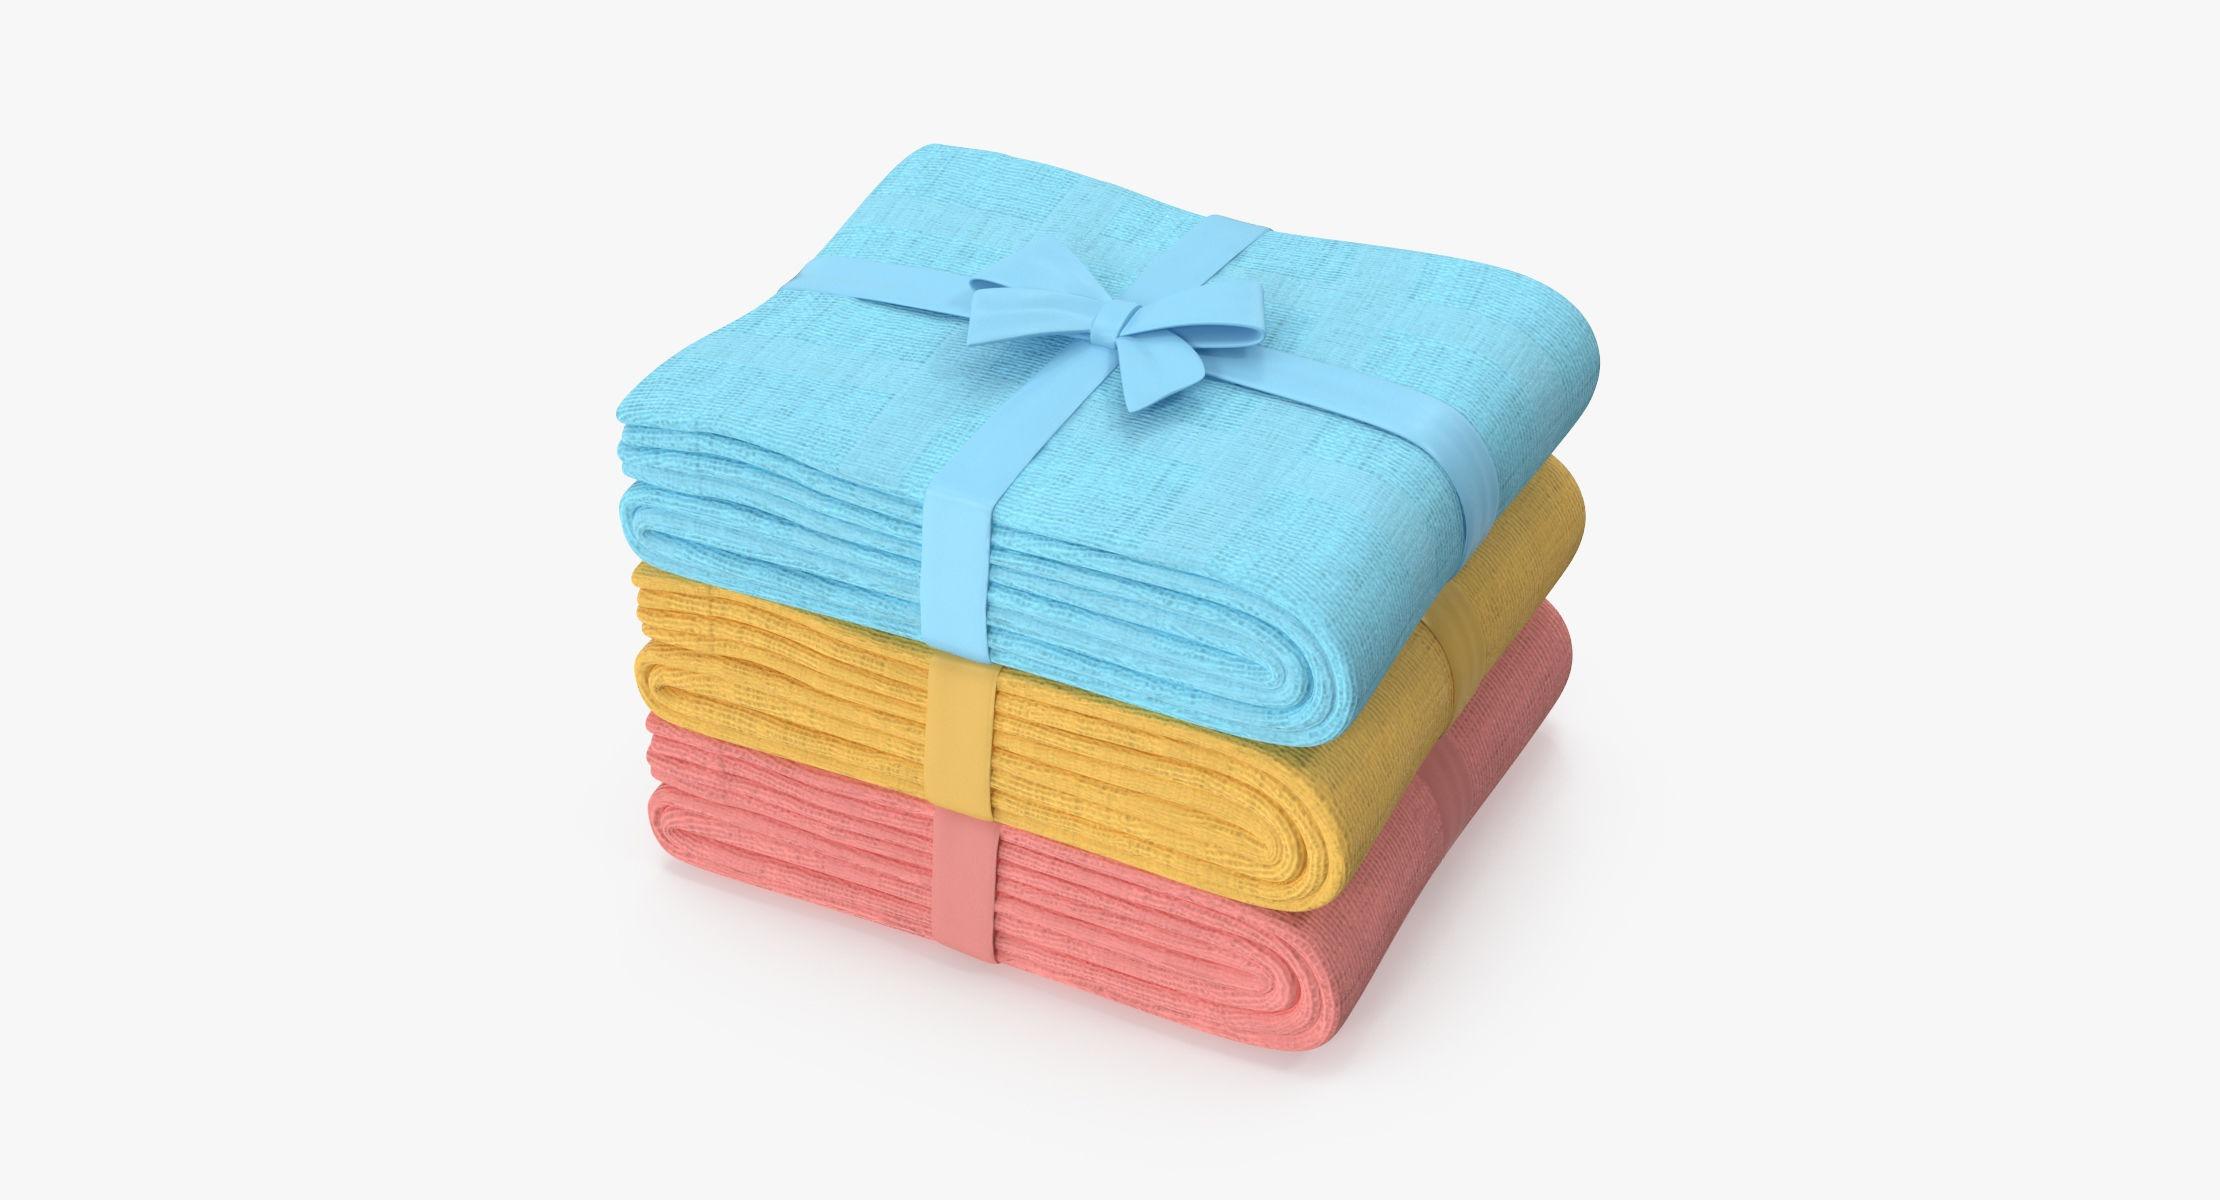 Baby Blankets 01 01 - reel 1